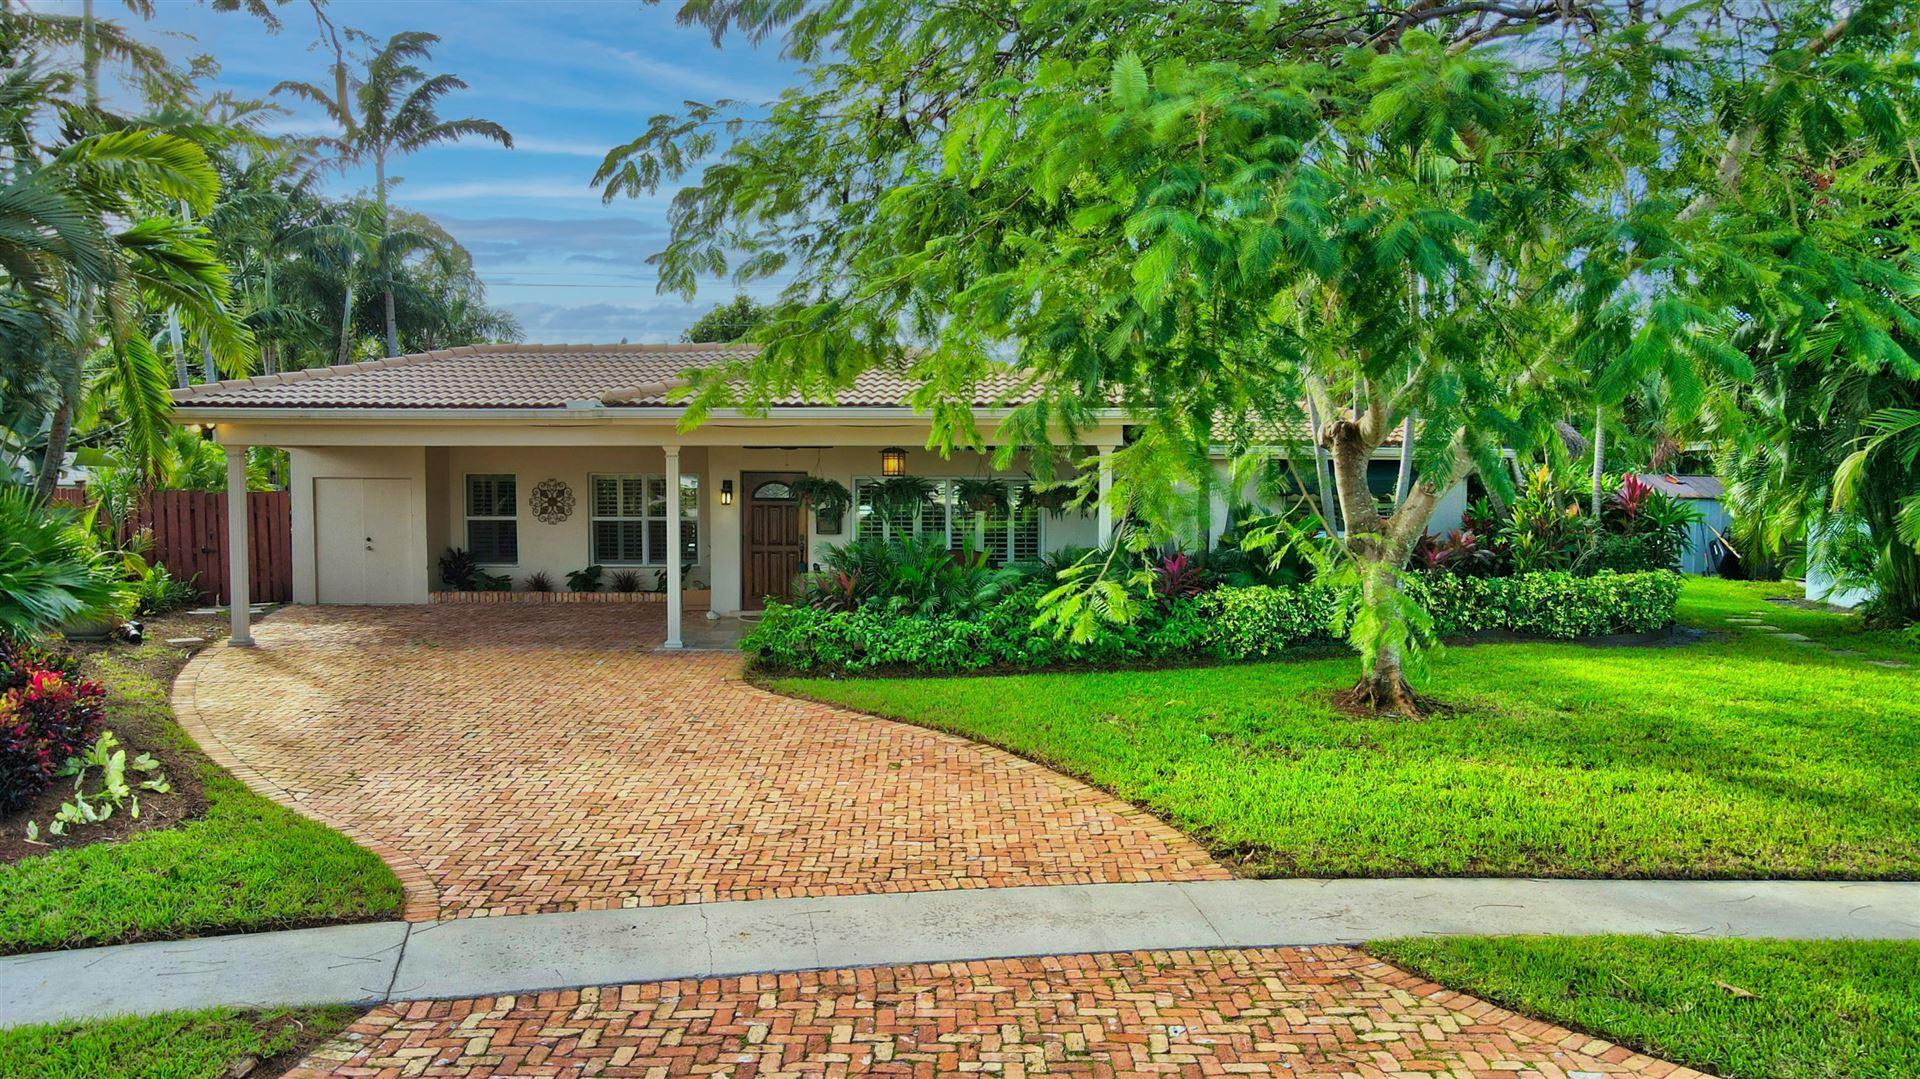 699 SW 8th Terrace, Boca Raton, FL 33486 - #: RX-10673029